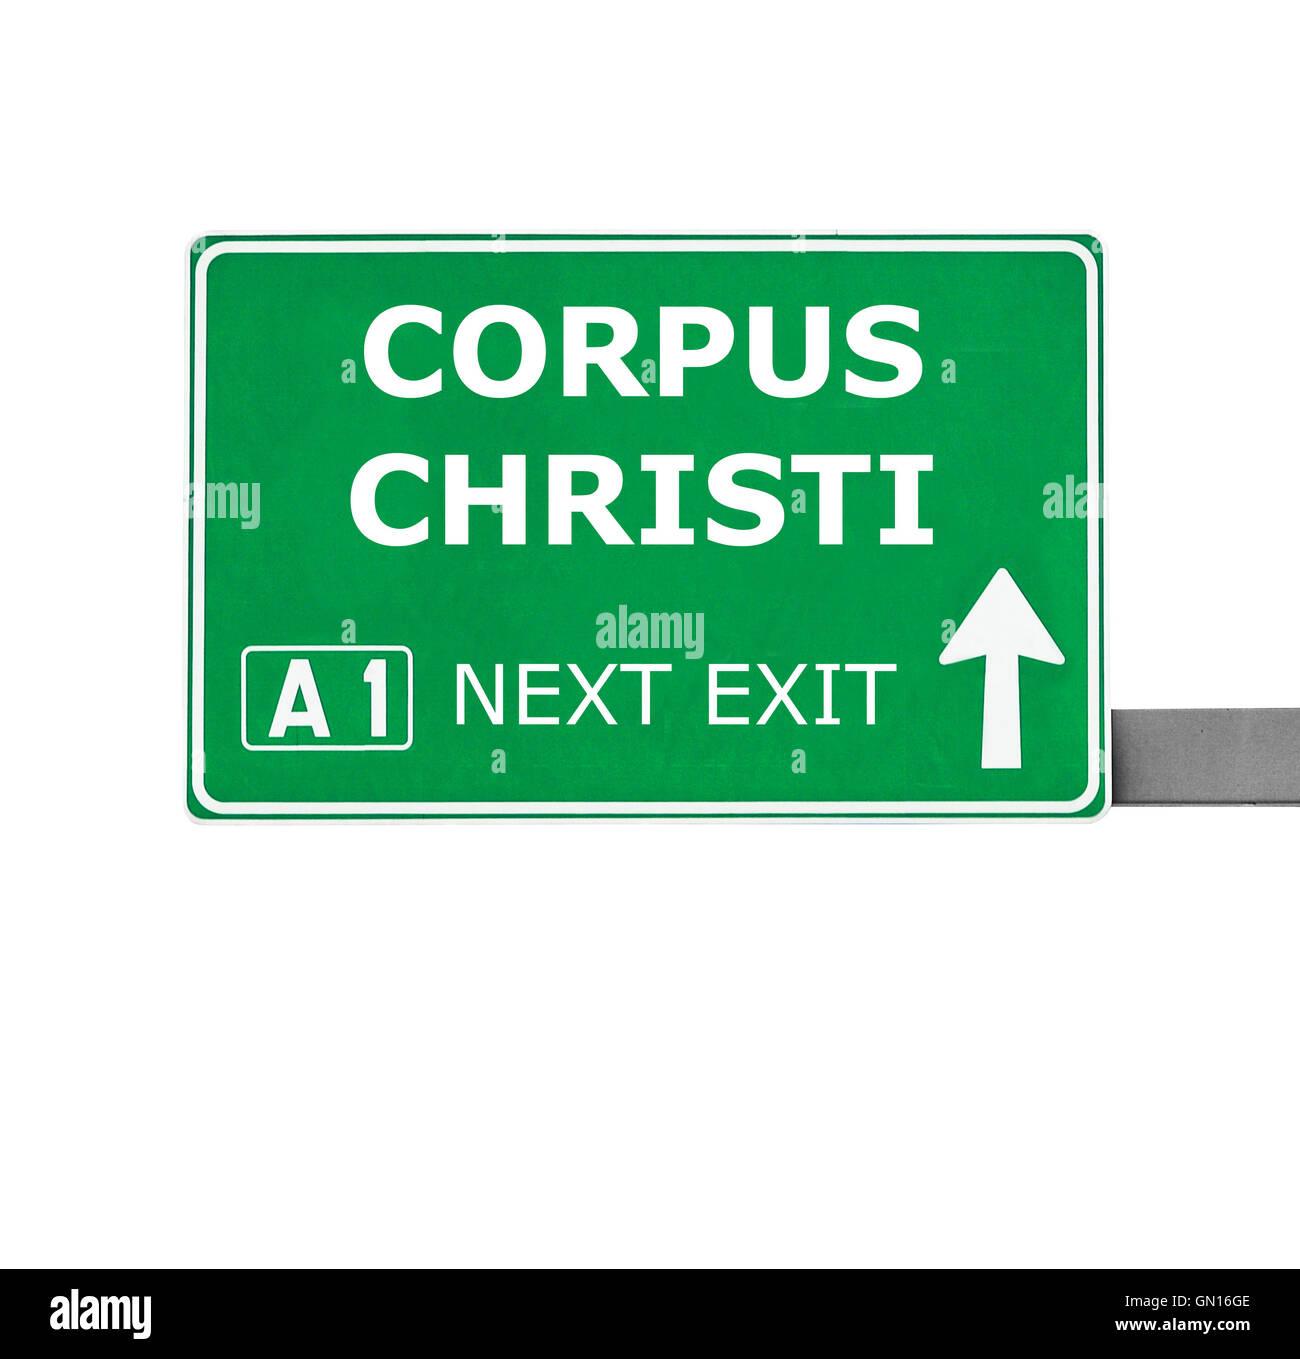 CORPUS CHRISTI road sign isolated on white - Stock Image